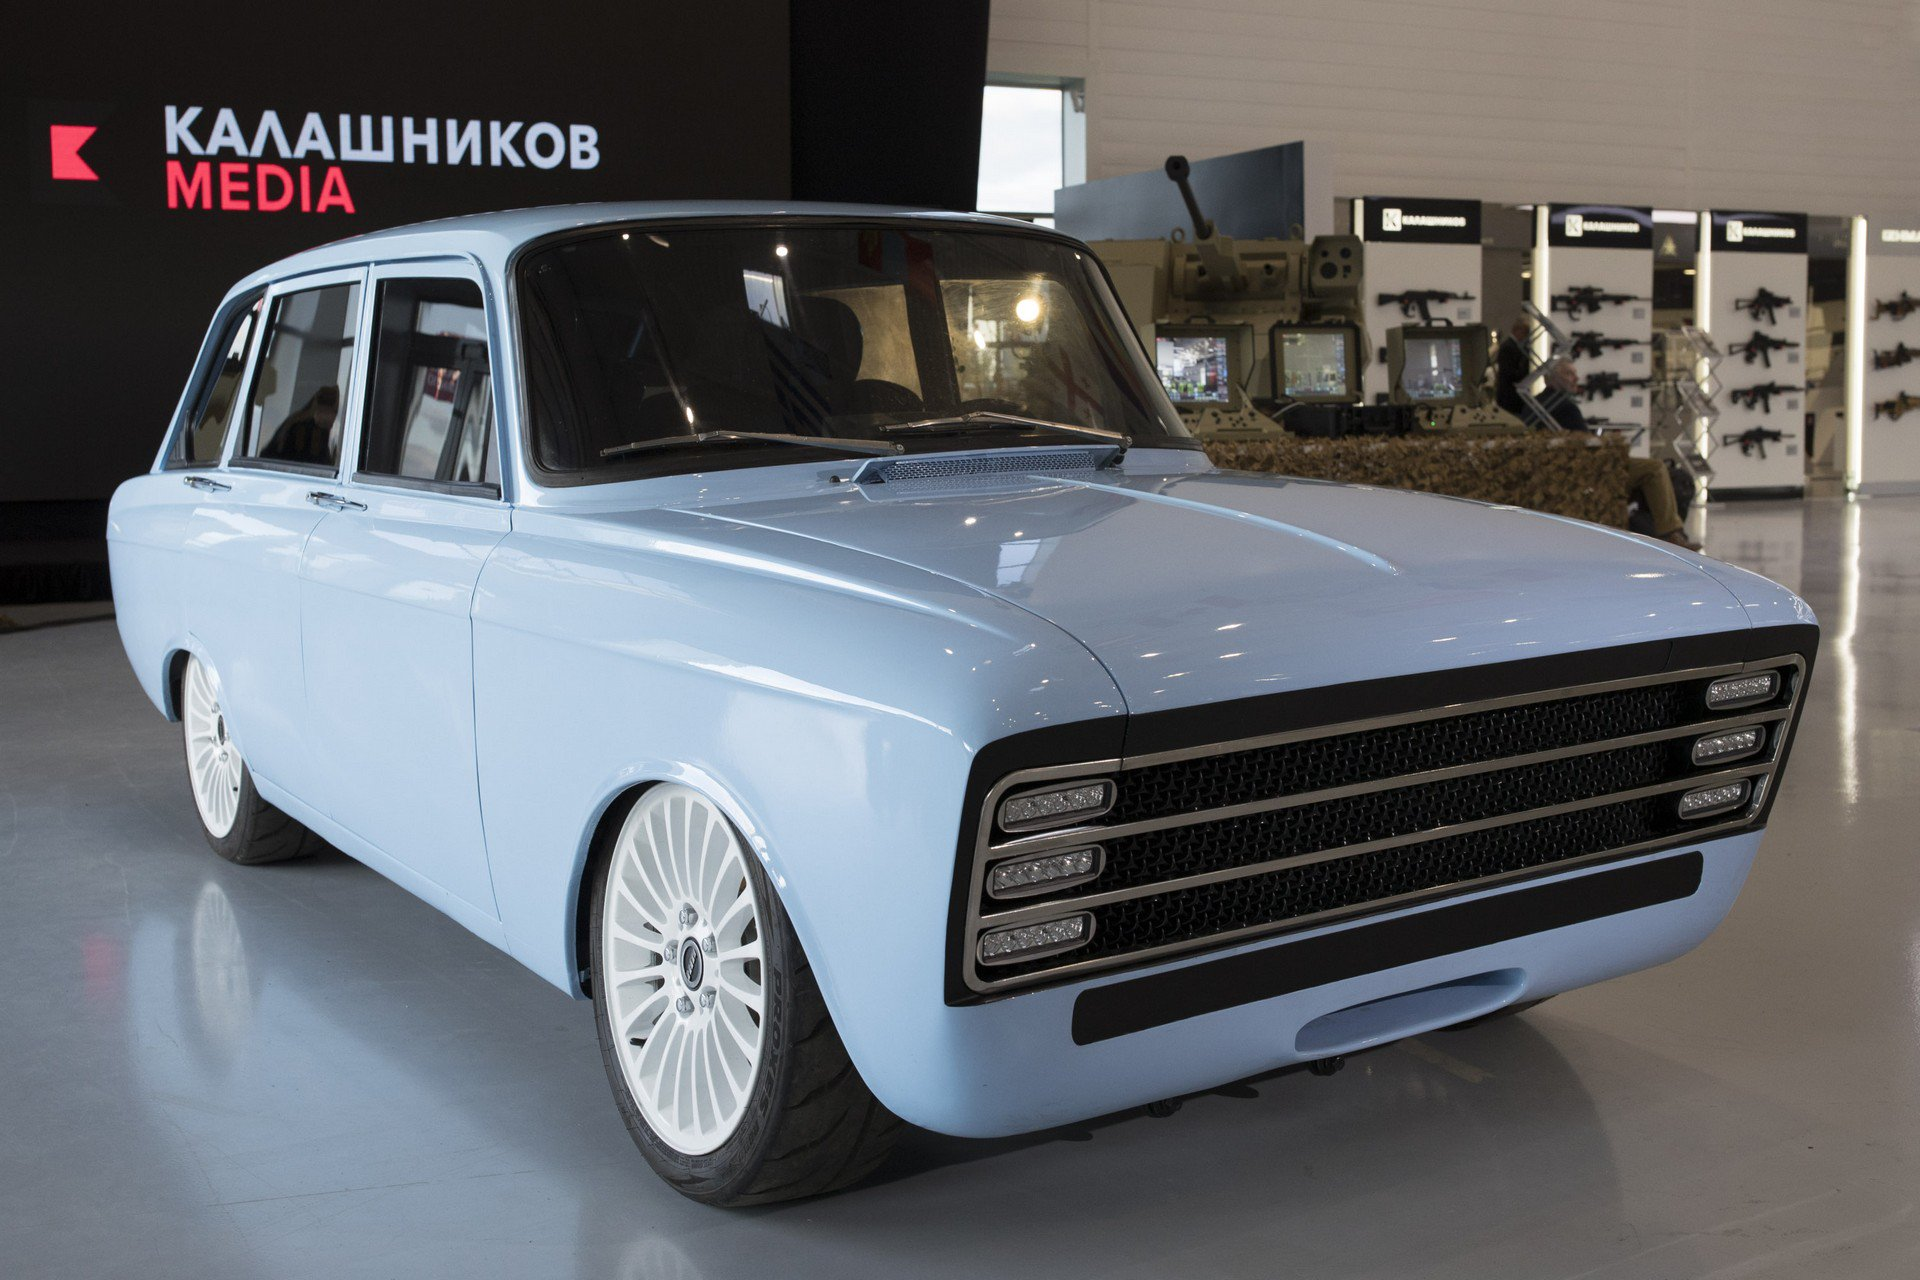 Kalashnikov CV-1 Concept (3)